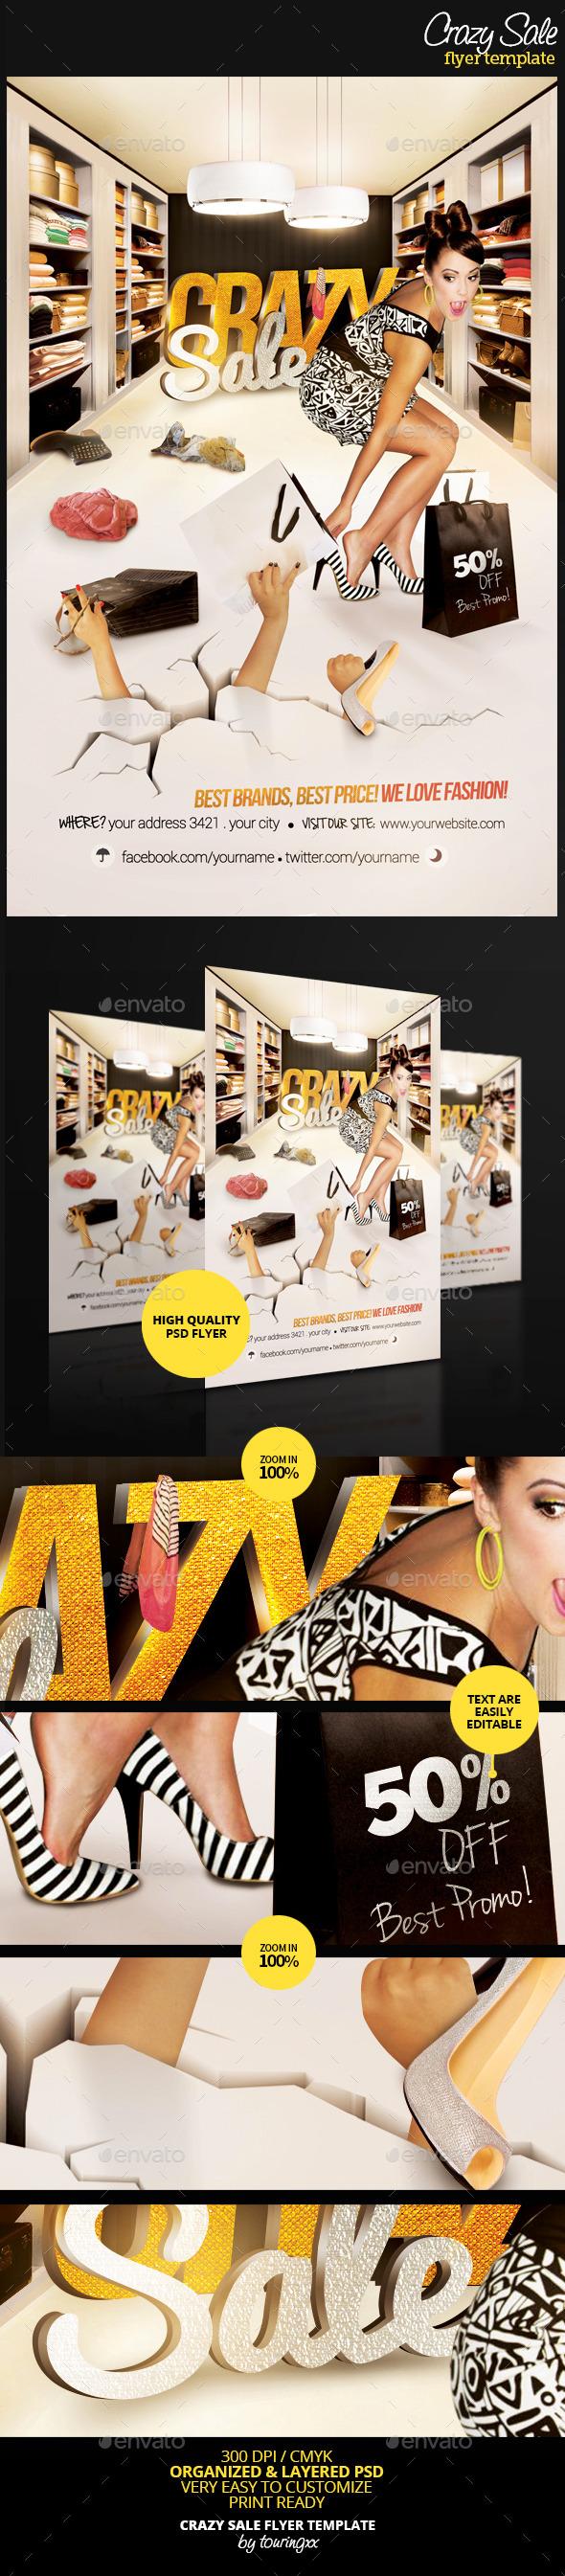 Crazy Sale Flyer Template - Flyers Print Templates